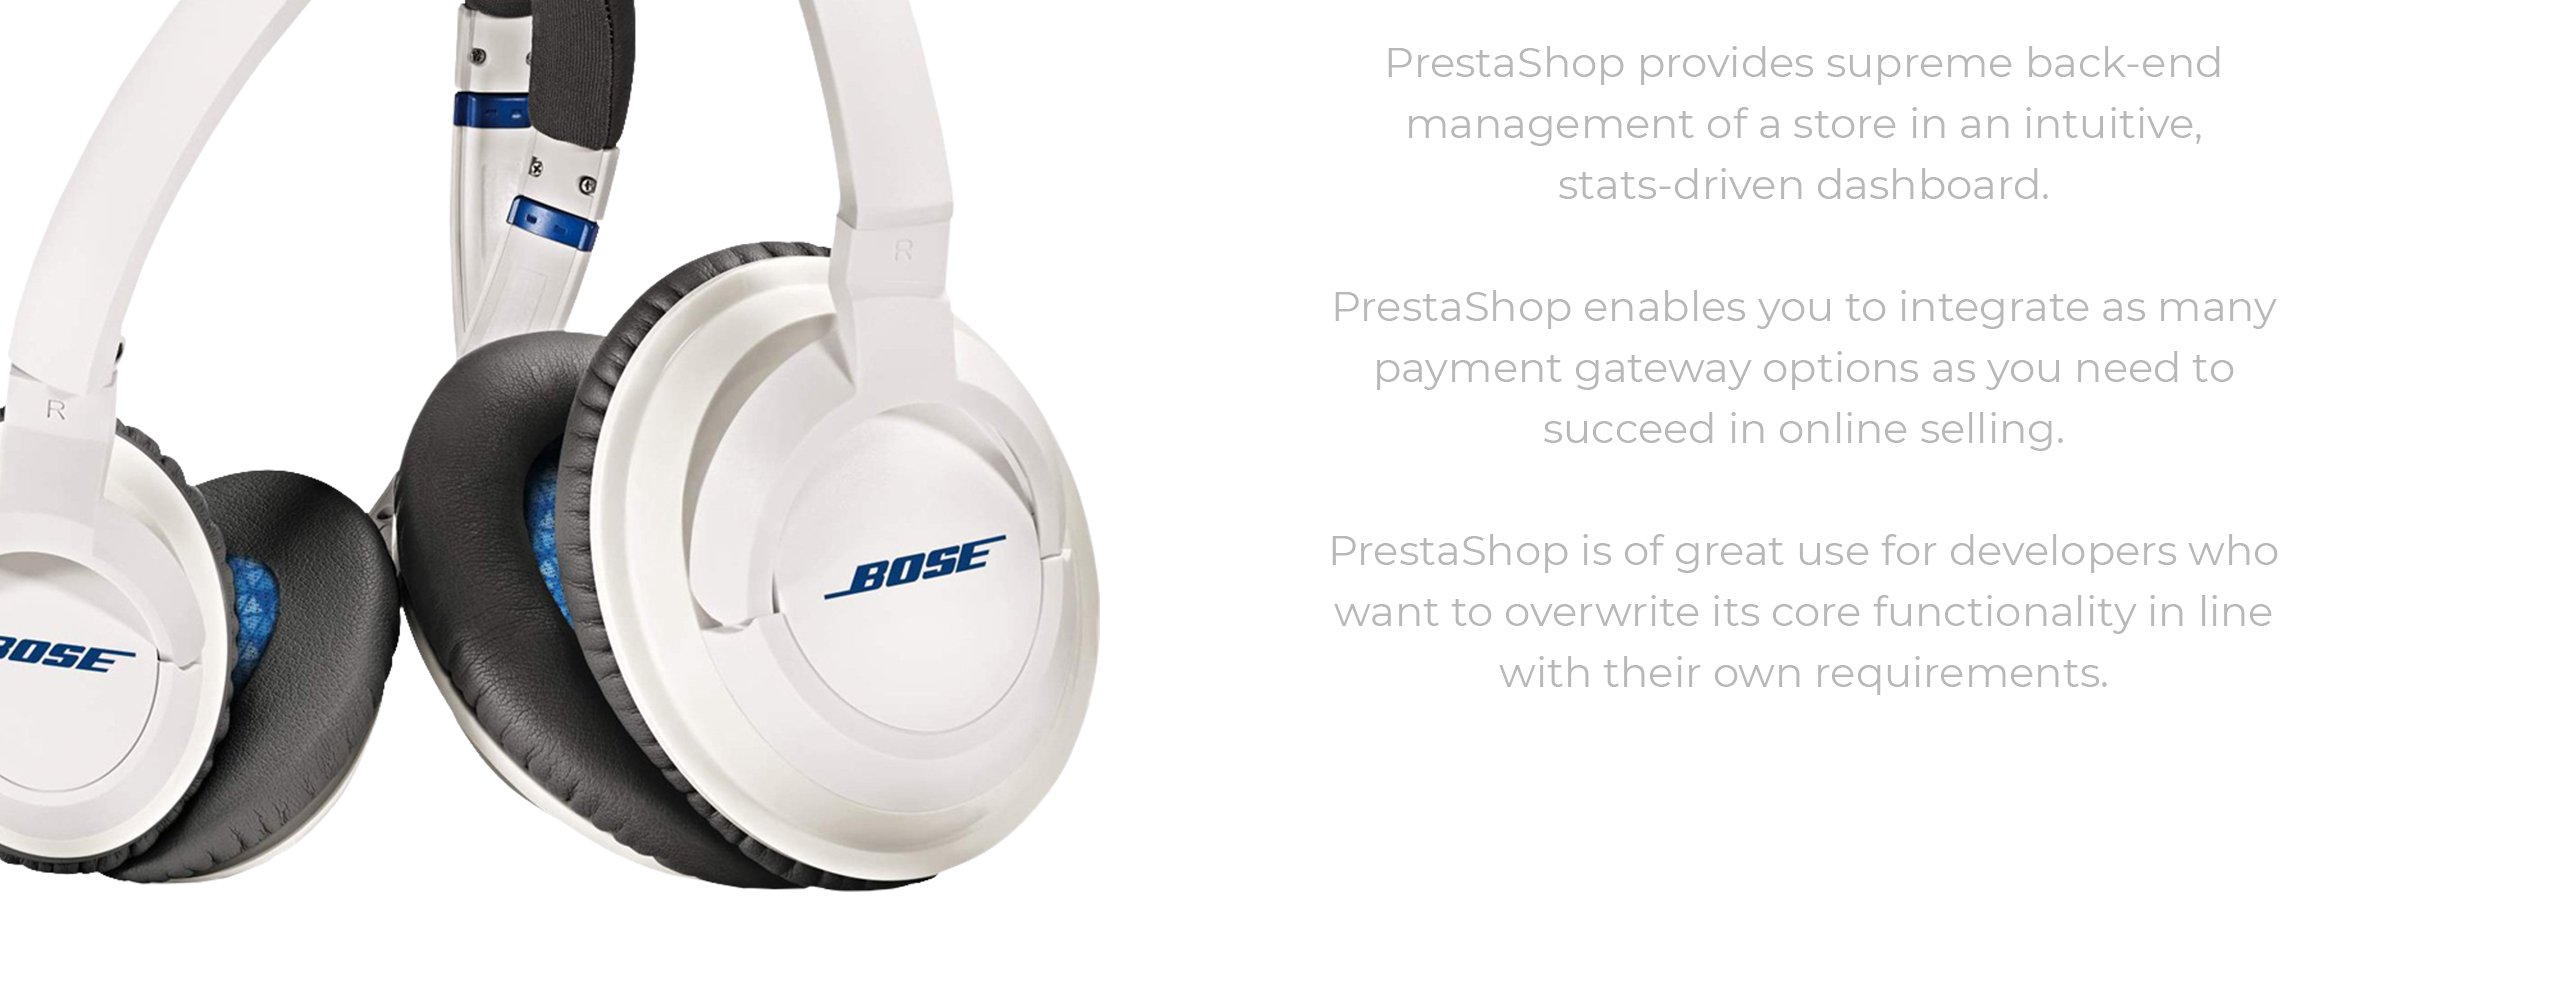 Nextprest - Electronics Store Clean Bootstrap Ecommerce PrestaShop